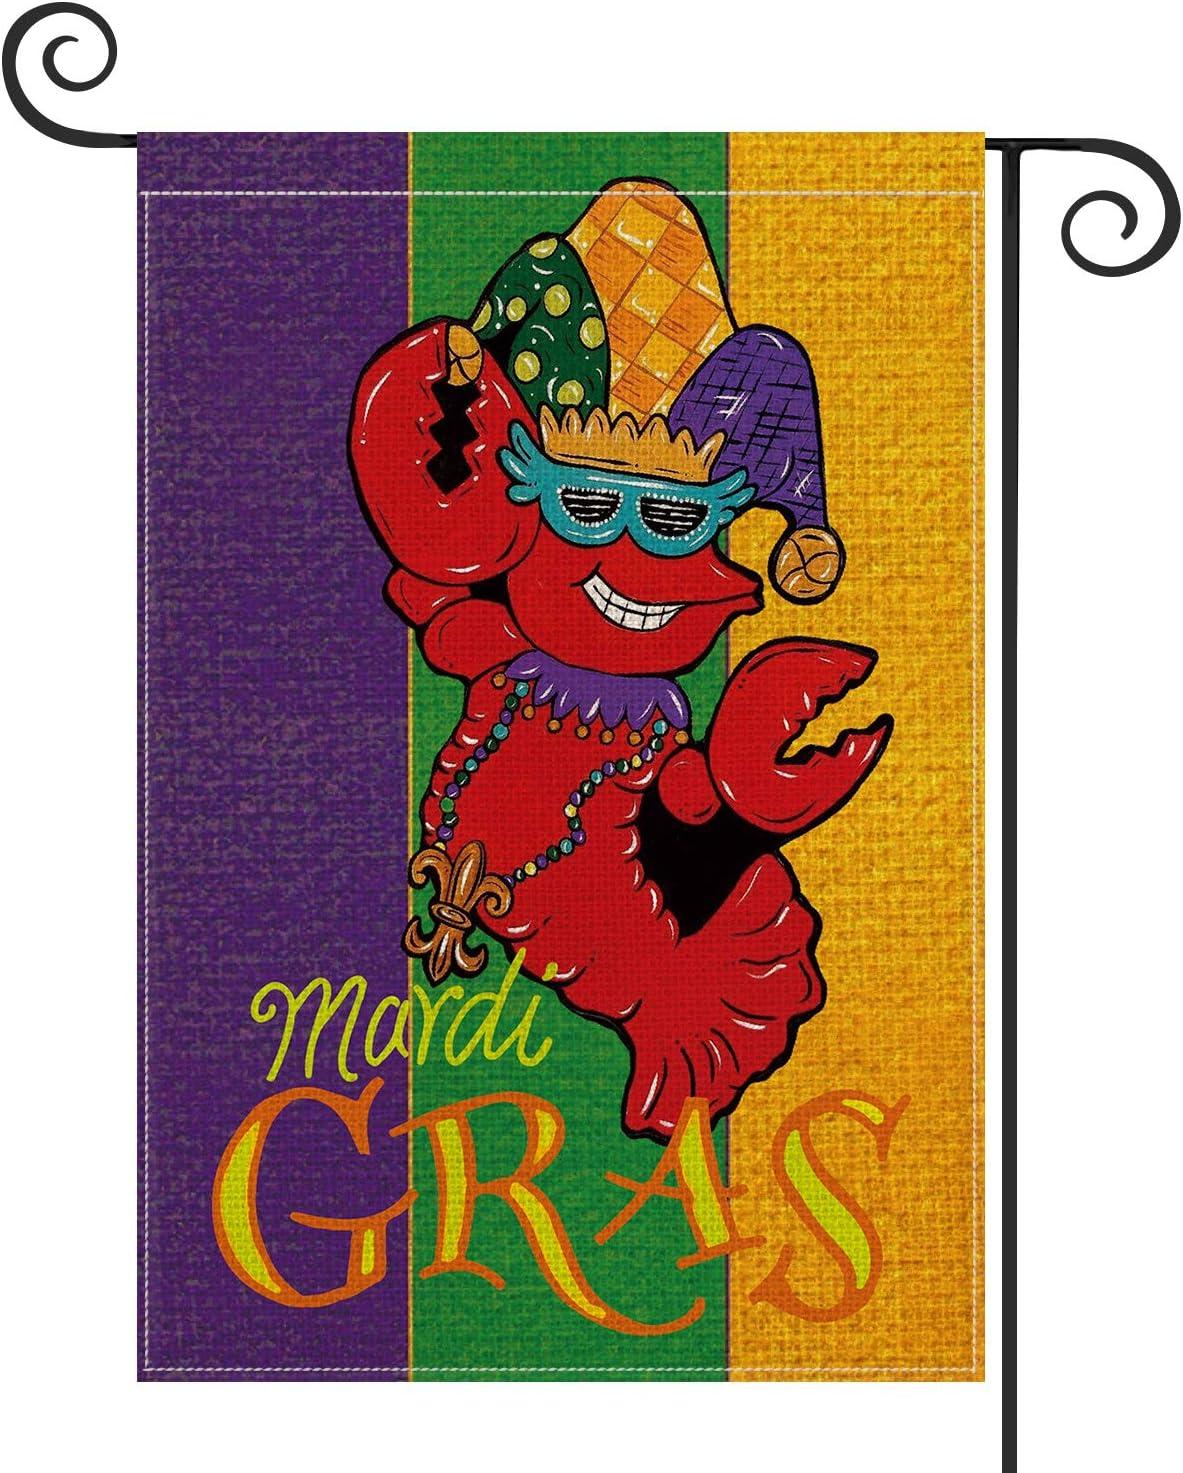 AVOIN Mardi Gras Crawfish Masquerade Mask Fleur de Lis Garden Flag Vertical Double Sized, Holiday Party Mardi Gras Bead Yard Outdoor Decoration 12.5 x 18 Inch